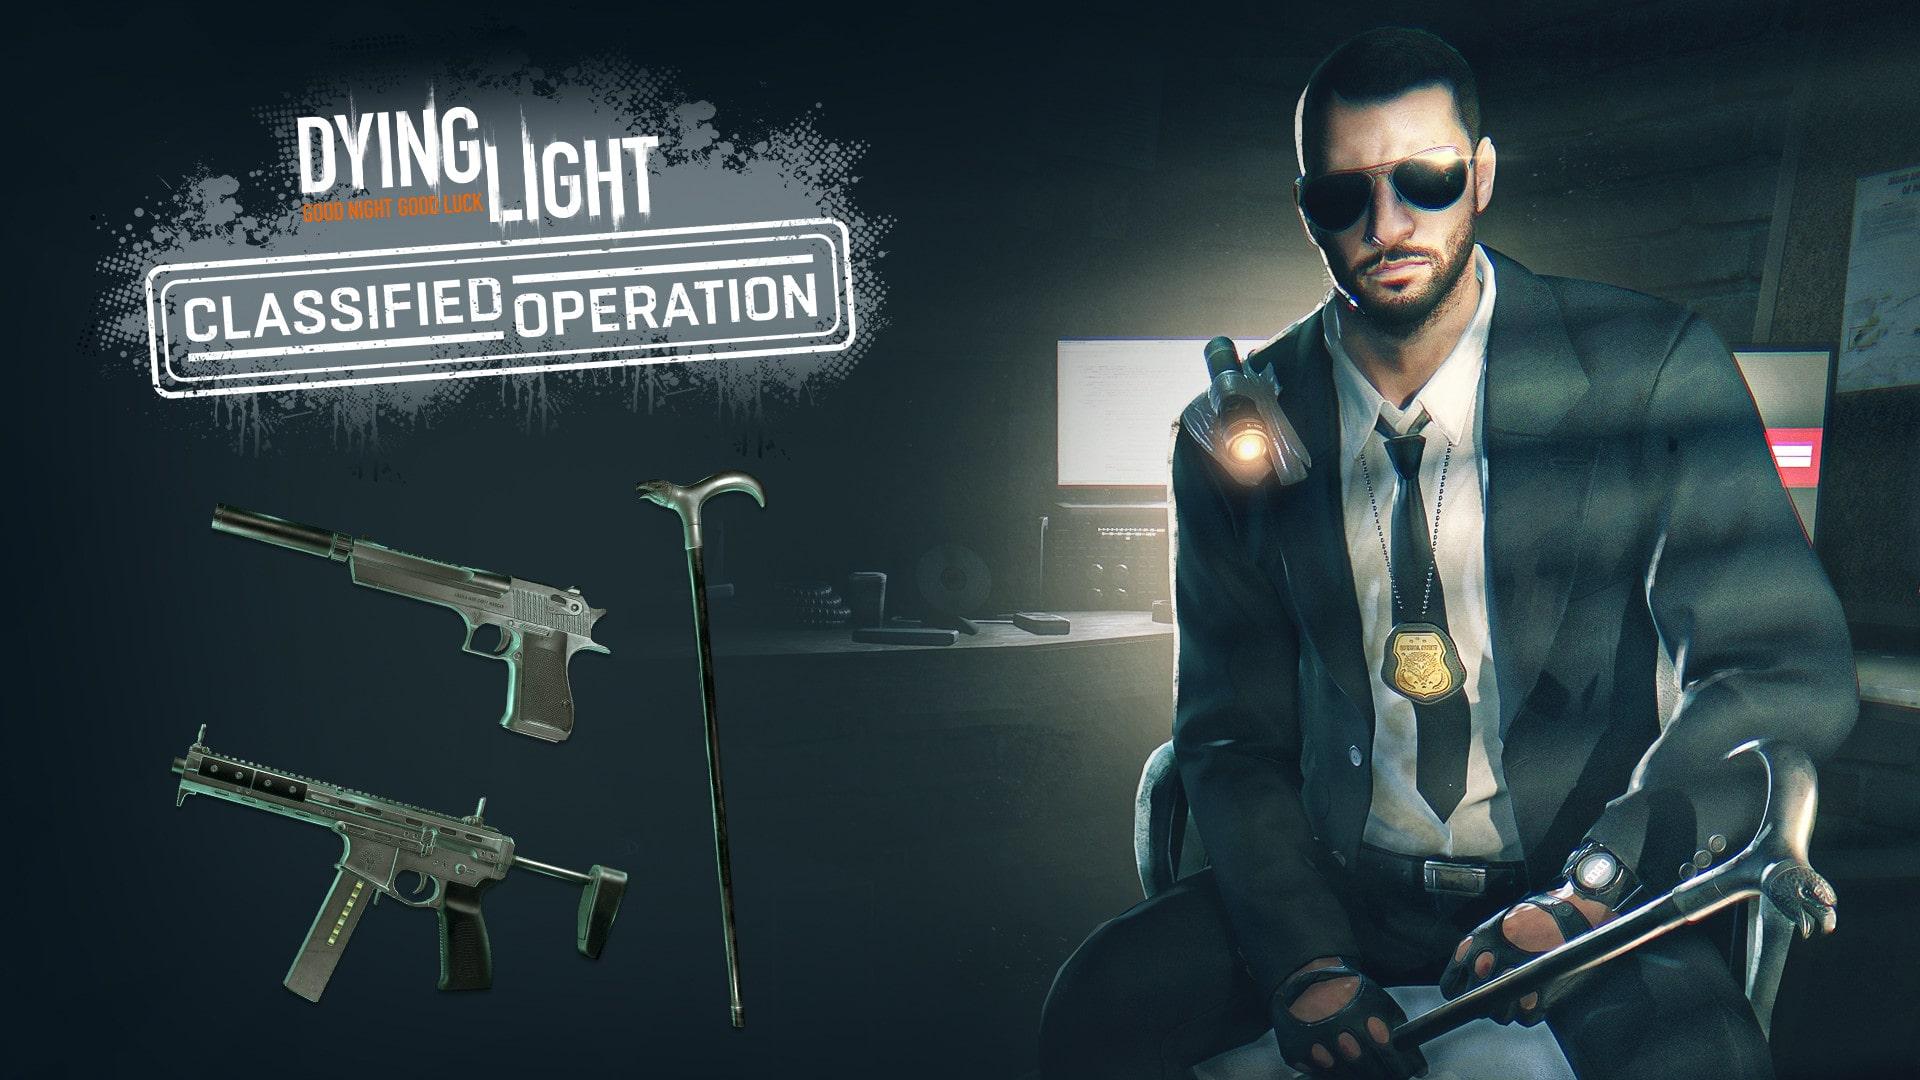 Dying Light - Classified Operation Bundle | WW (099c15ea-c717-4d67-9f21-a43423683bb4)